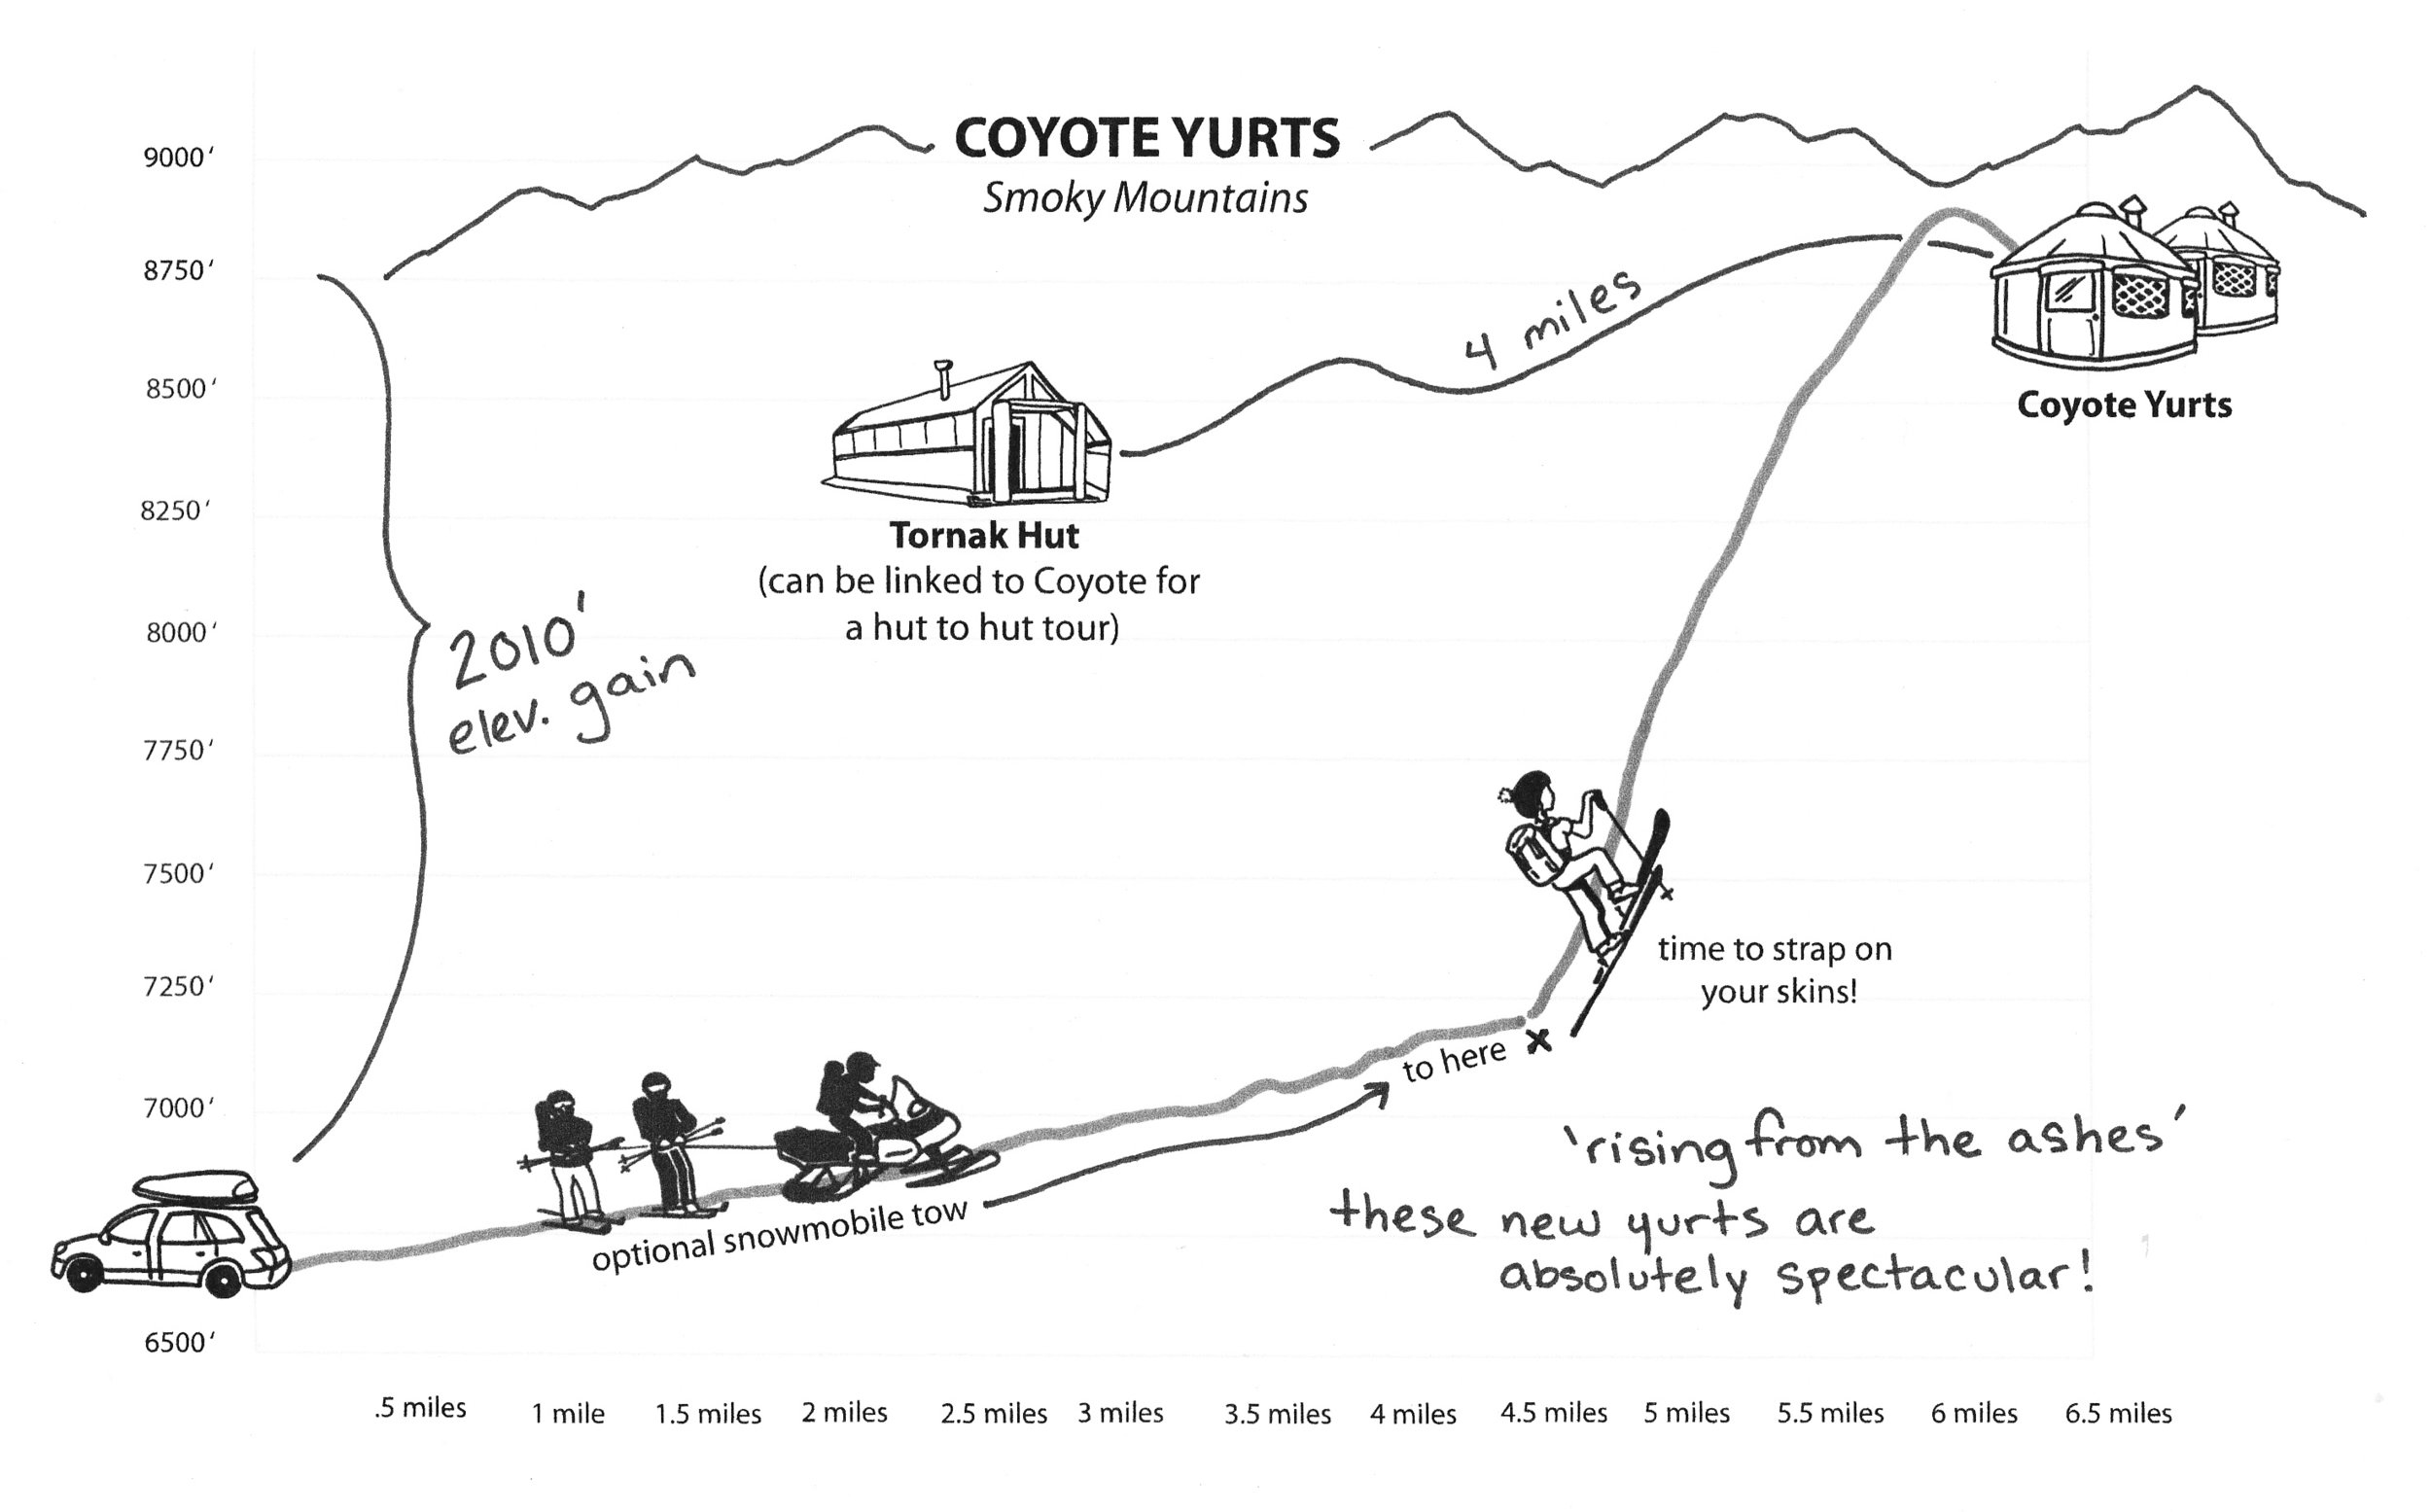 Coyote Yurts.jpg